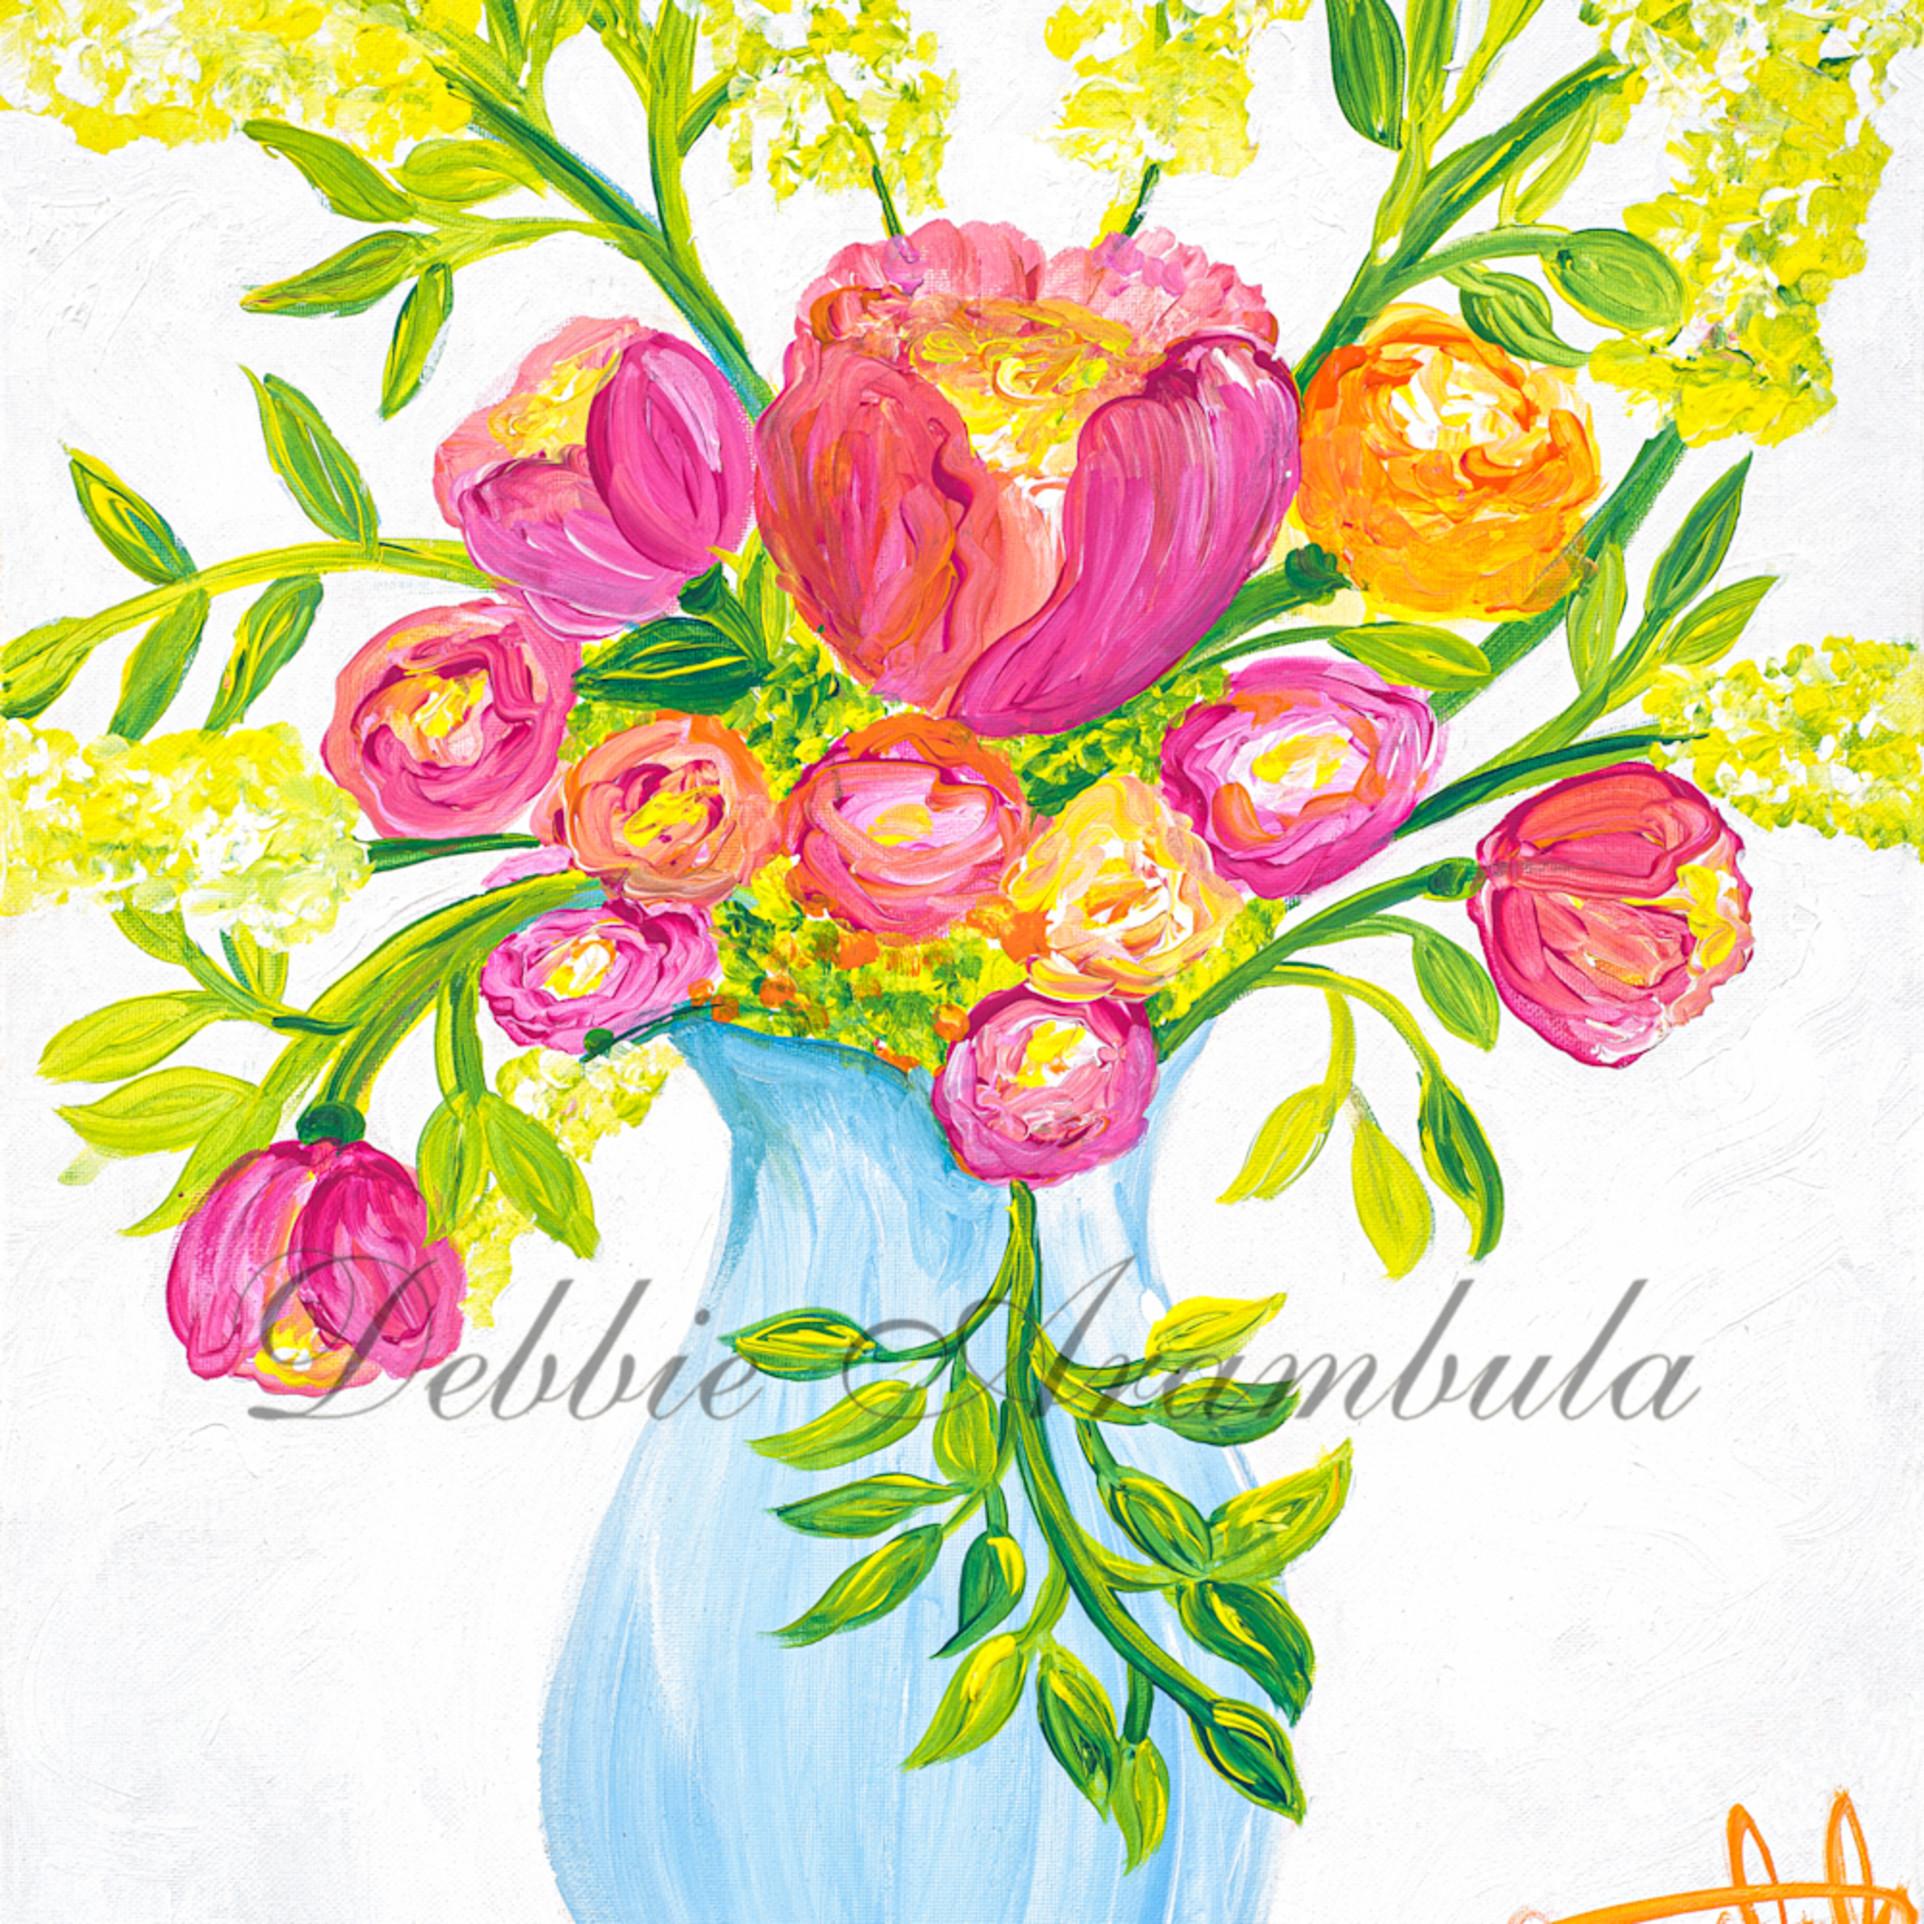 Bouquet of love k8snxt